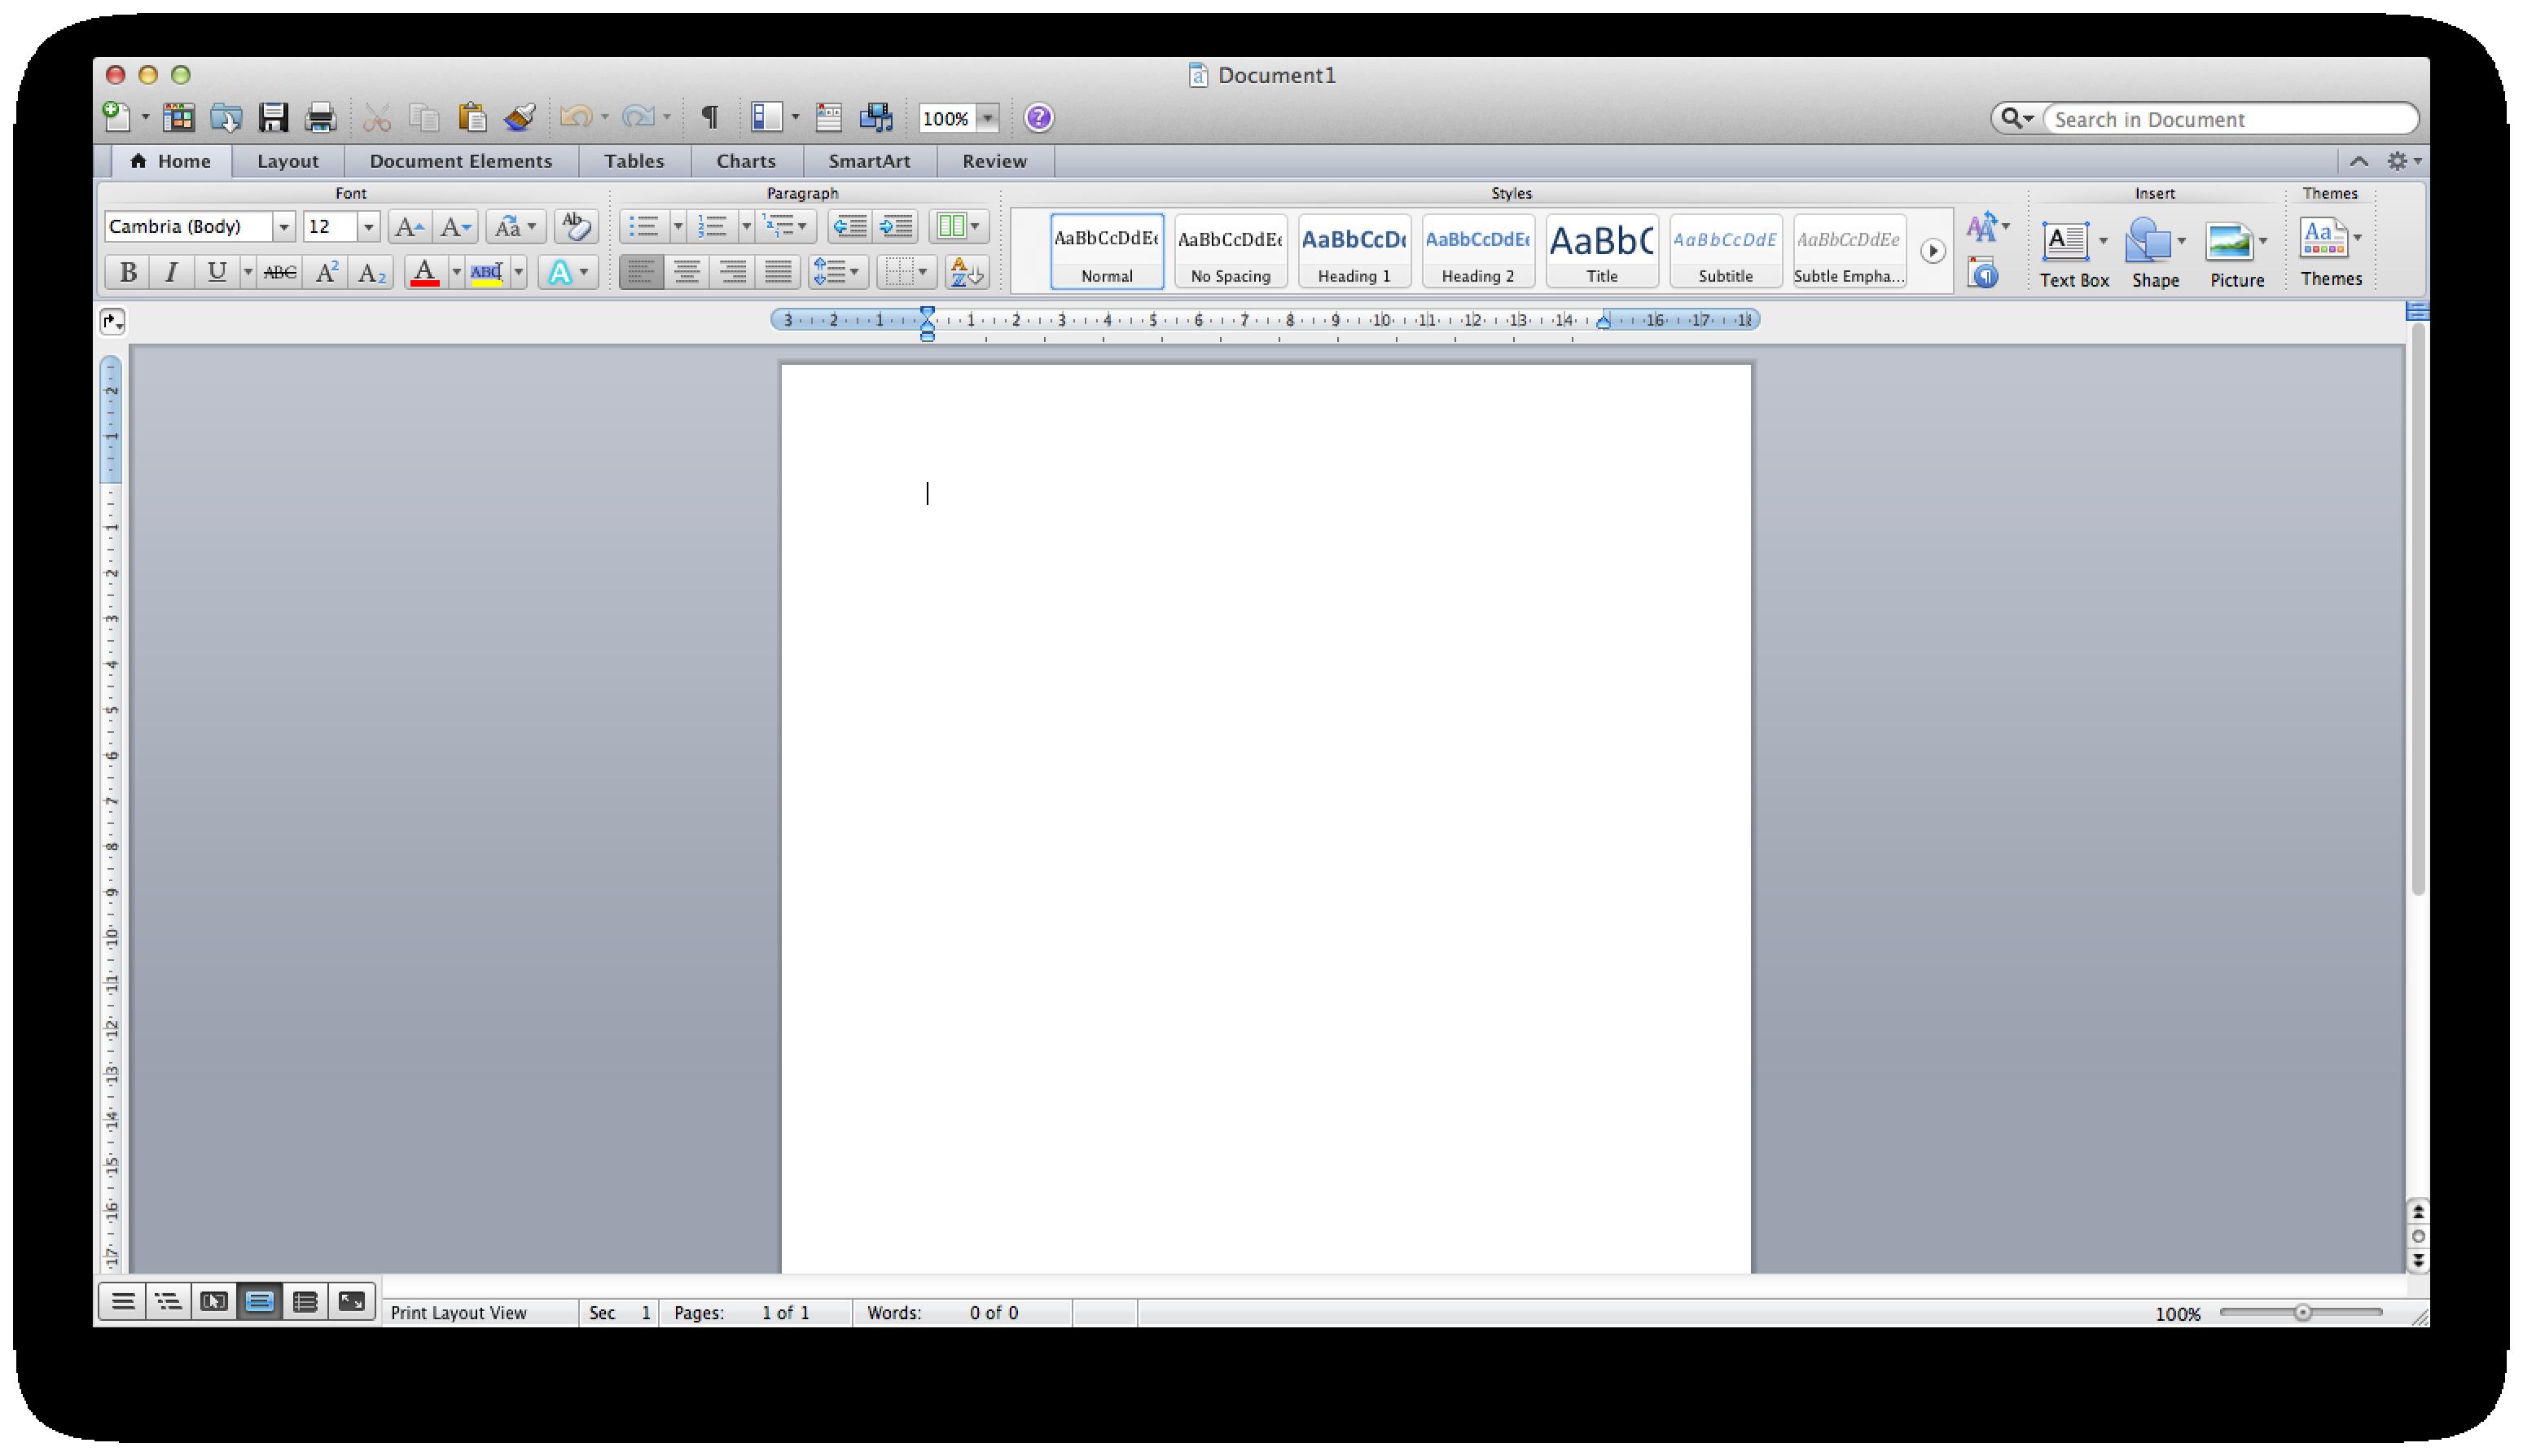 how to make screenshot on macbook pro retina